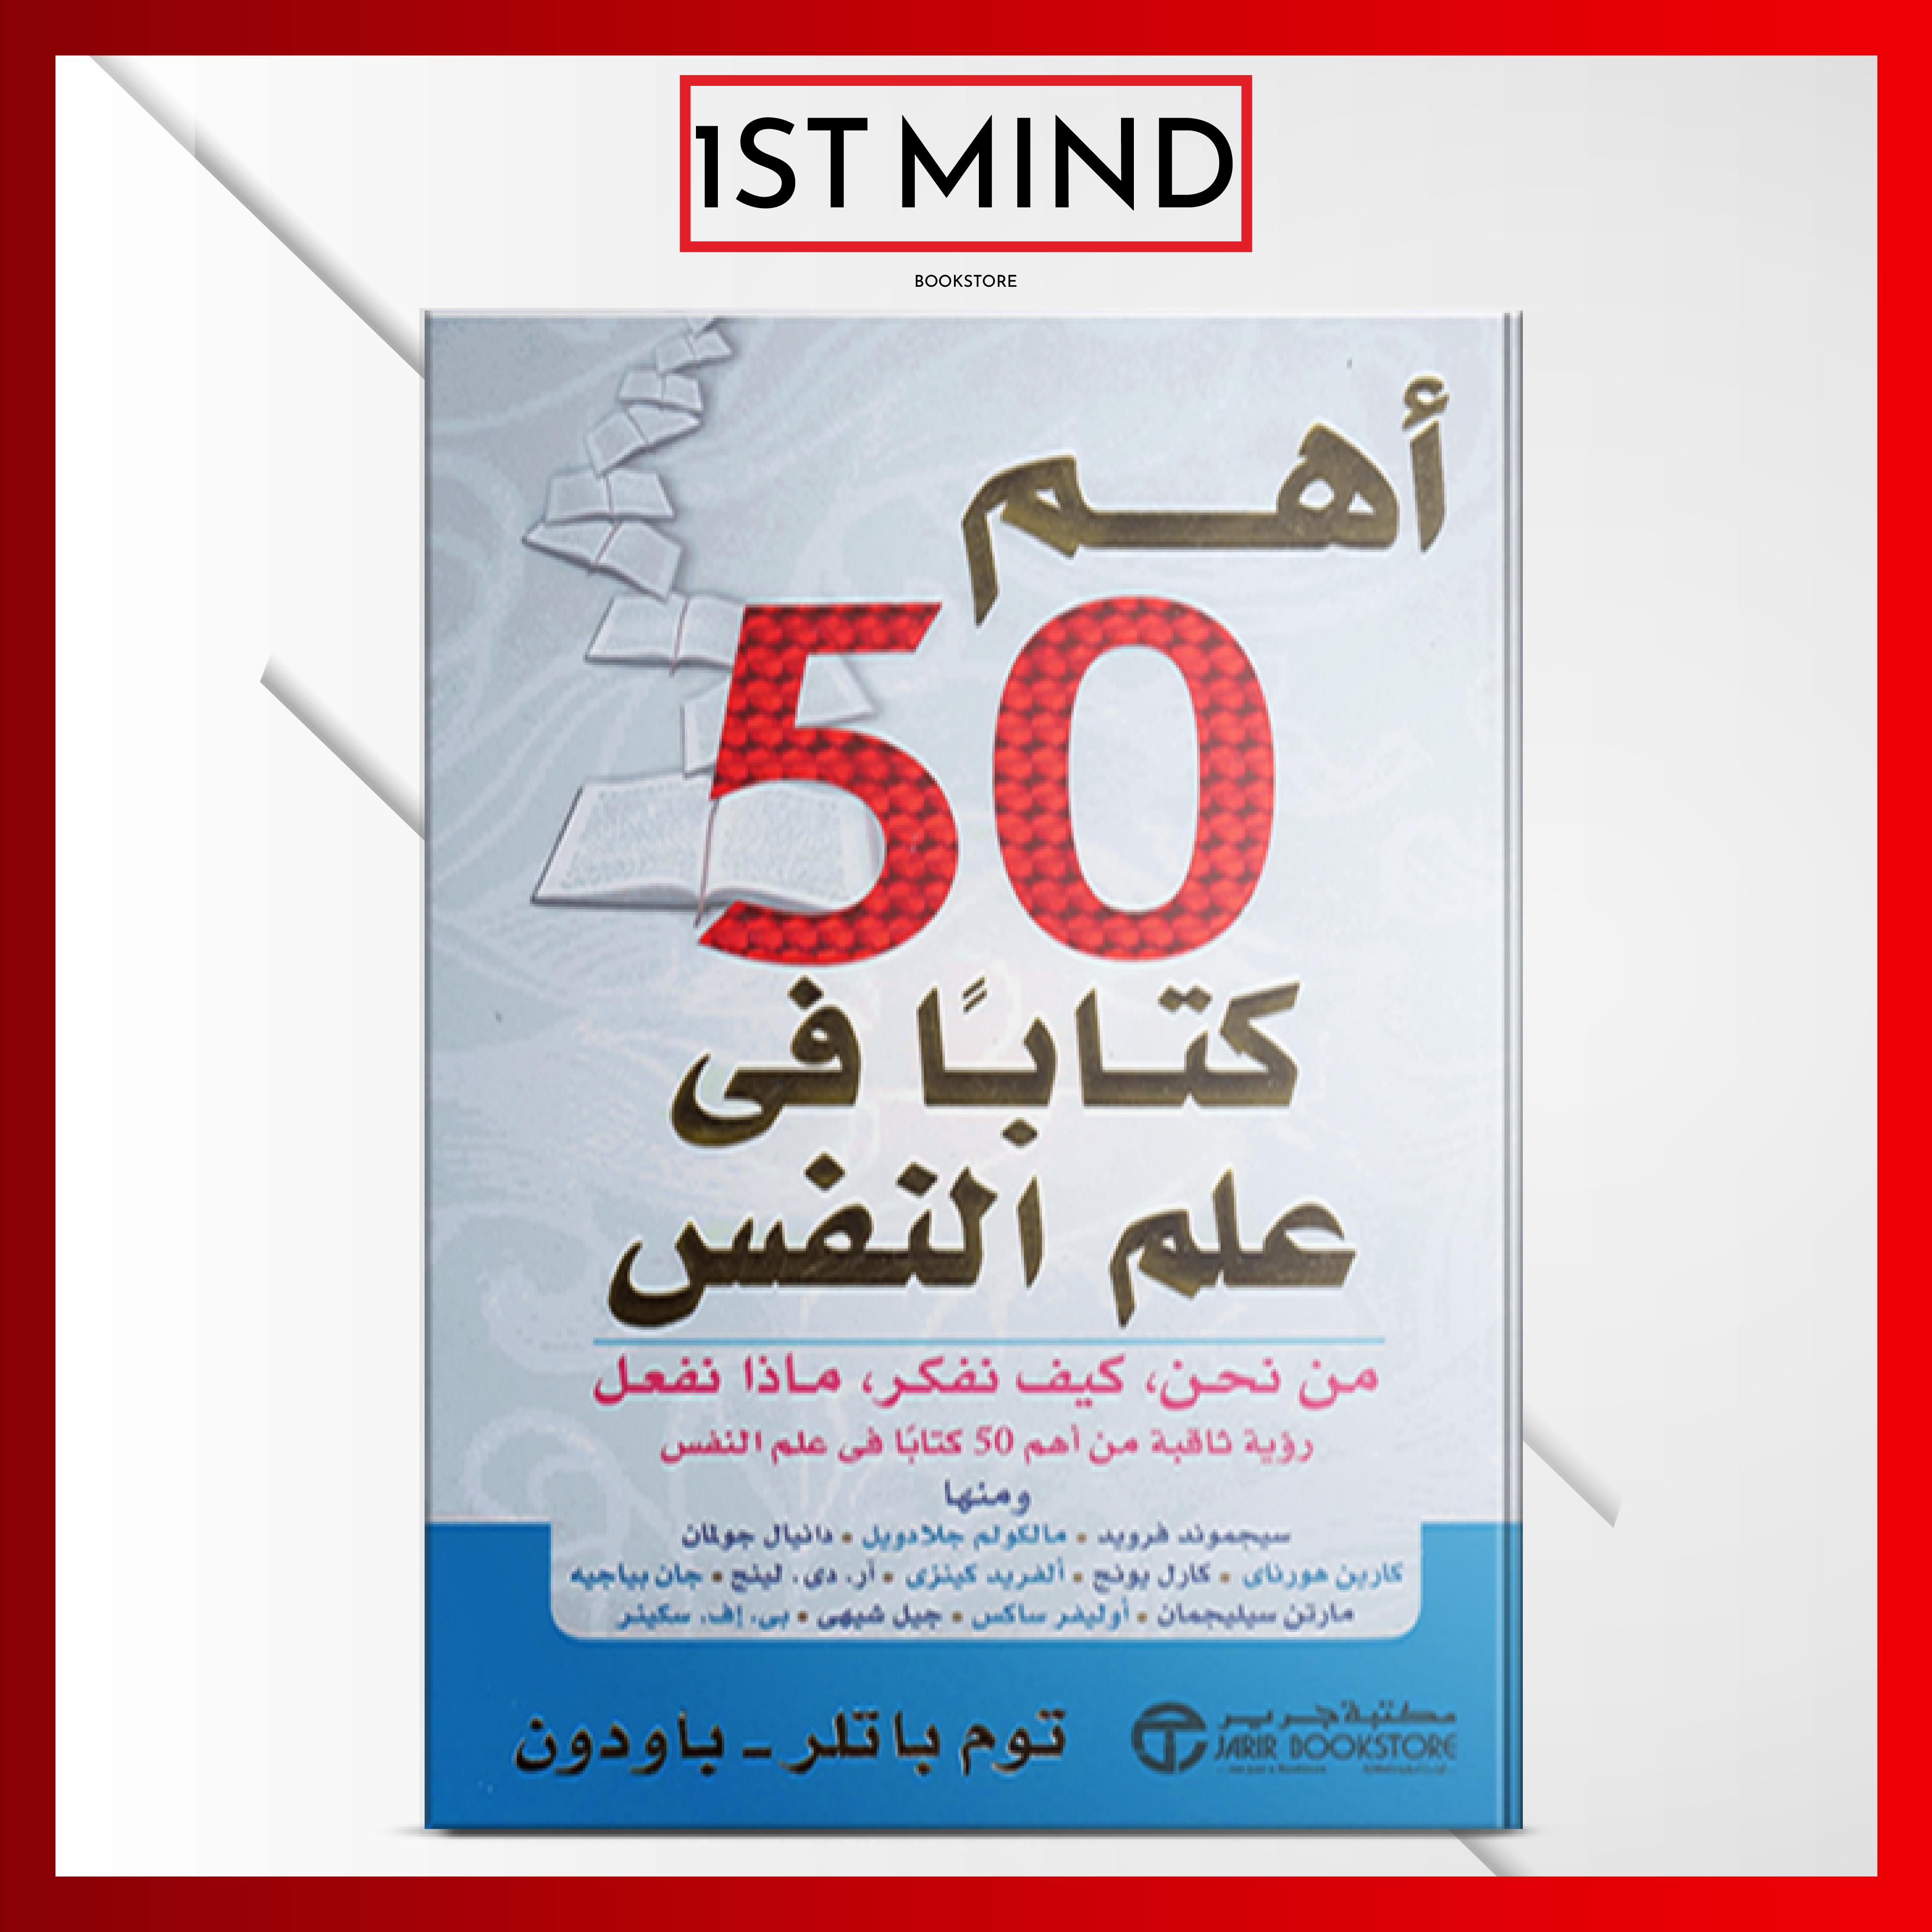 اهم 50 كتابا في علم النفس Books Convenience Store Products